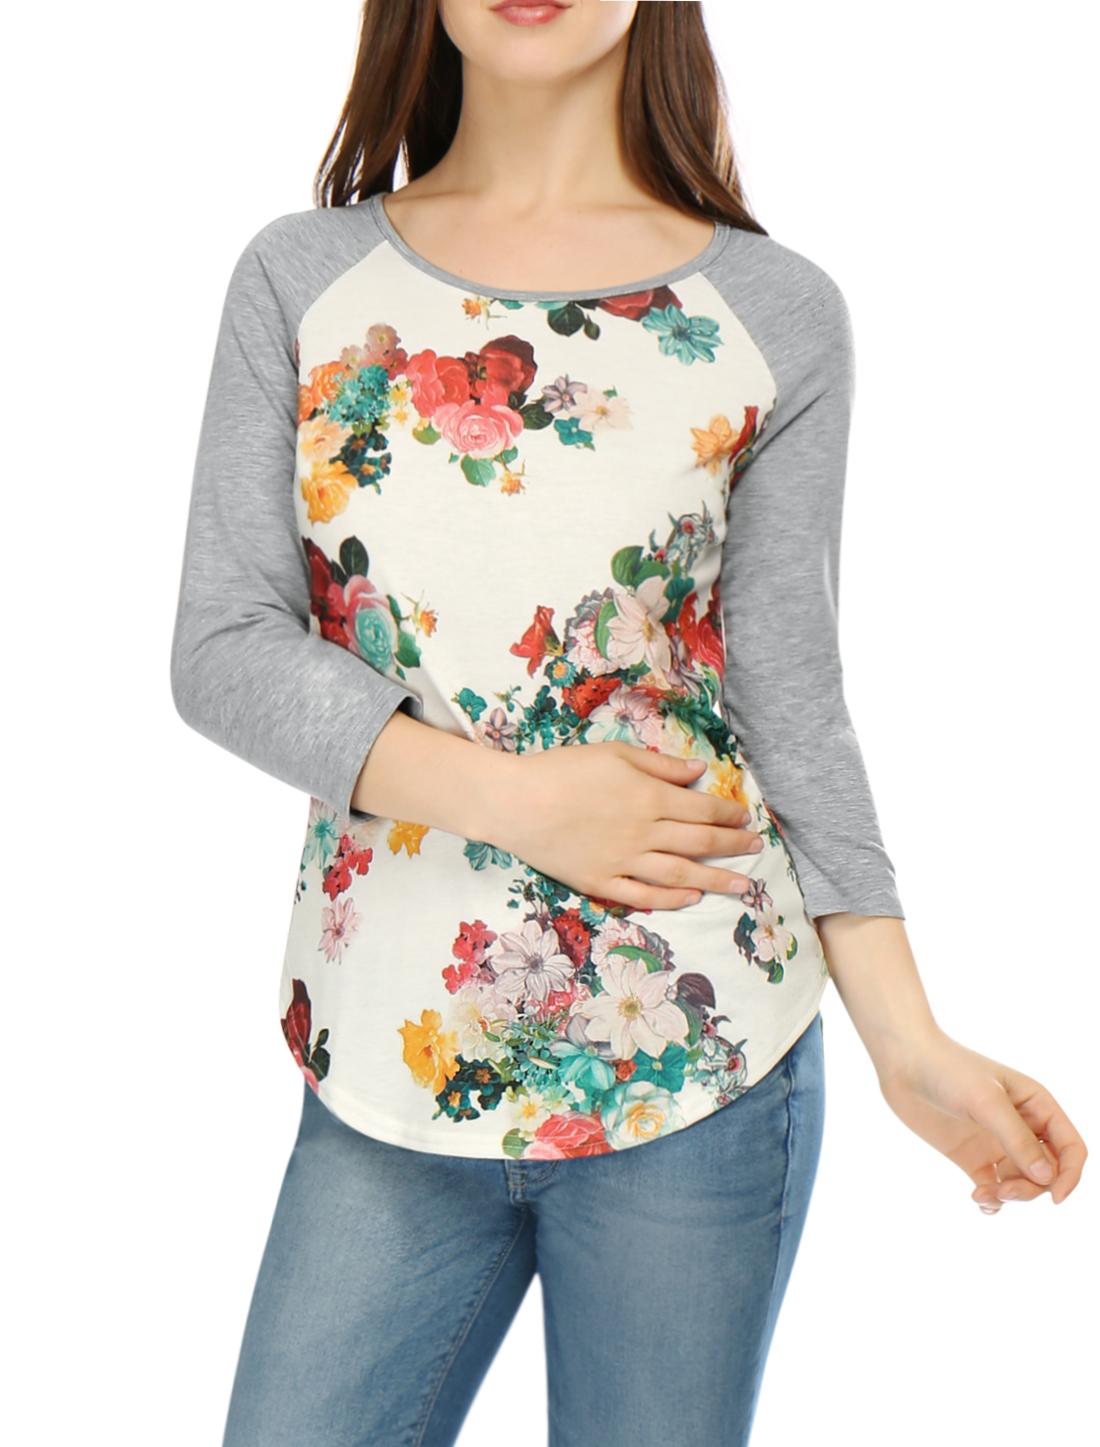 Women Floral Prints 3/4 Raglan Sleeves Tee Shirt White L